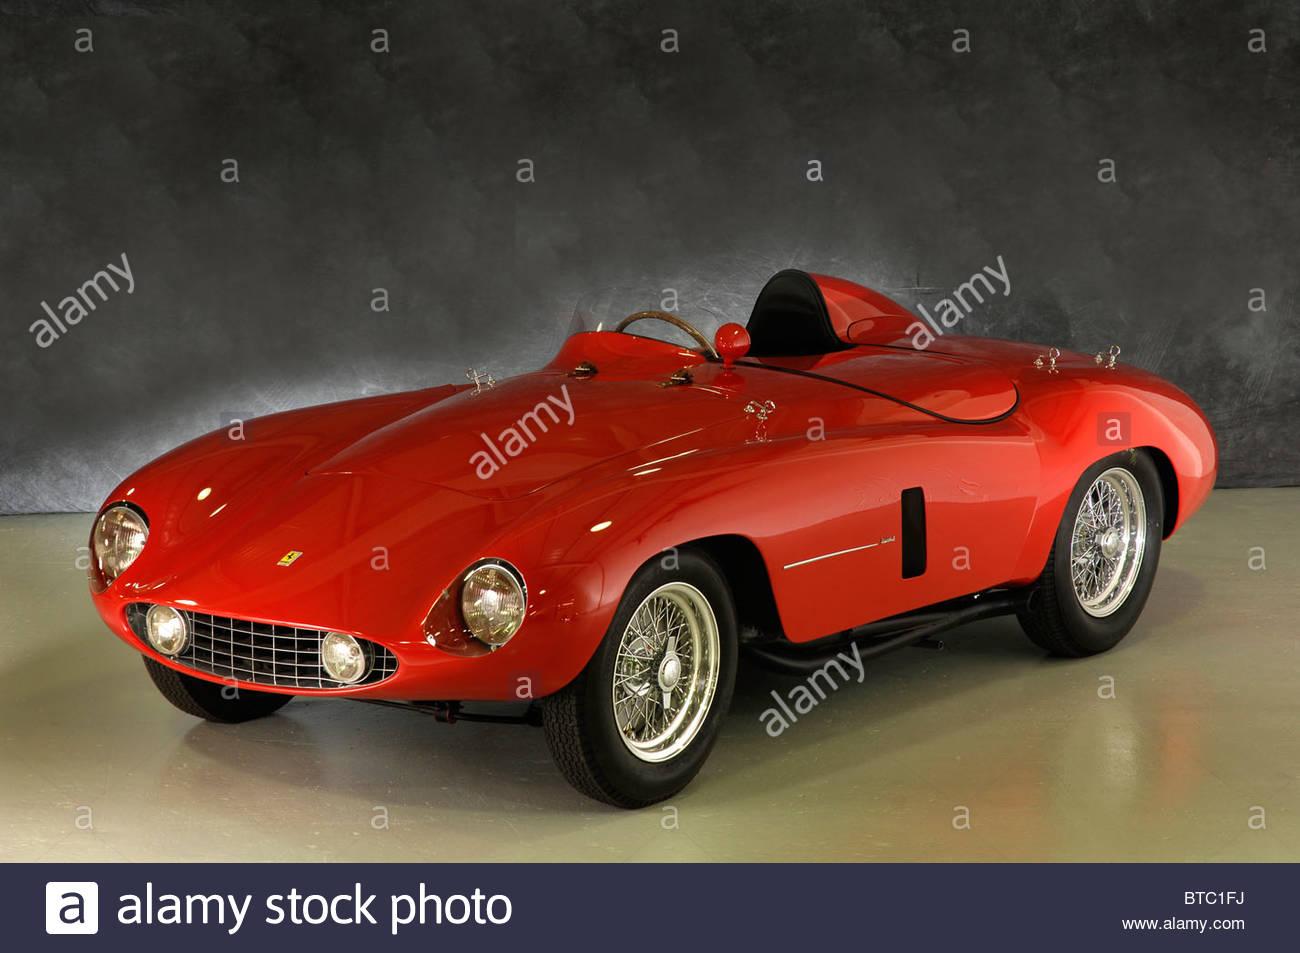 Ferrari 750 Monza 1955 - Stock Image